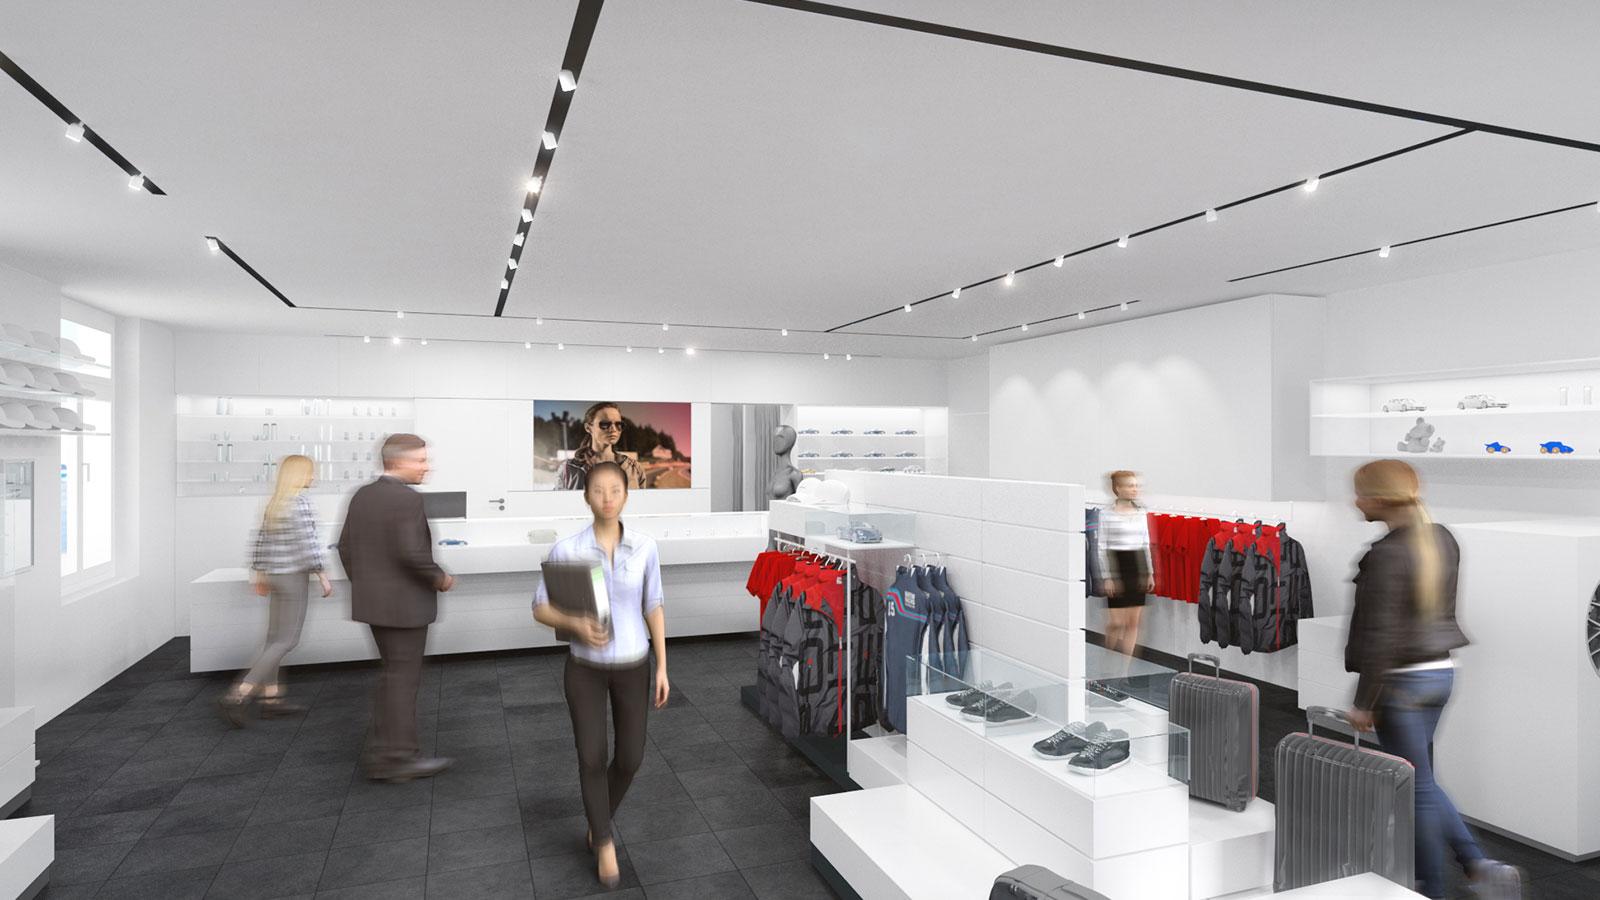 Porsche Accessories Shop. Fashion, accessories, vehicle accessories and more.